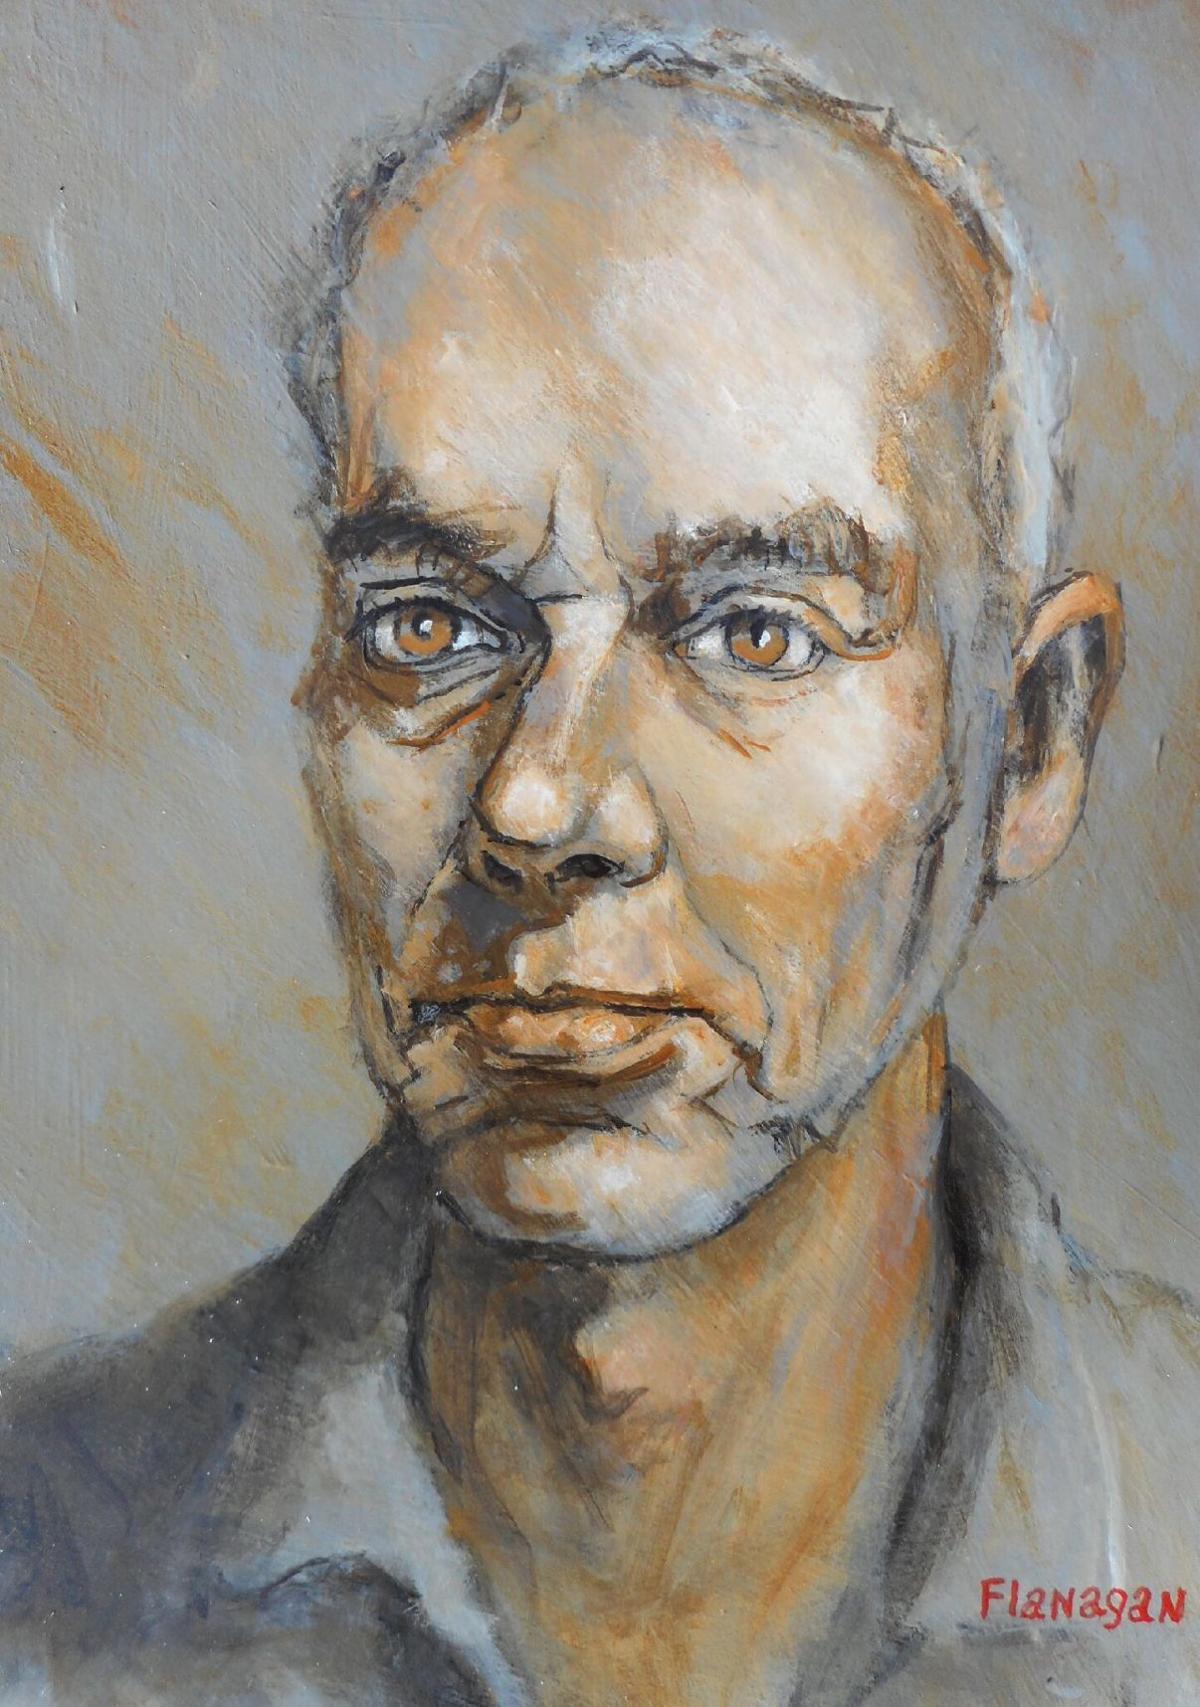 Flanagan Self Portrait.png